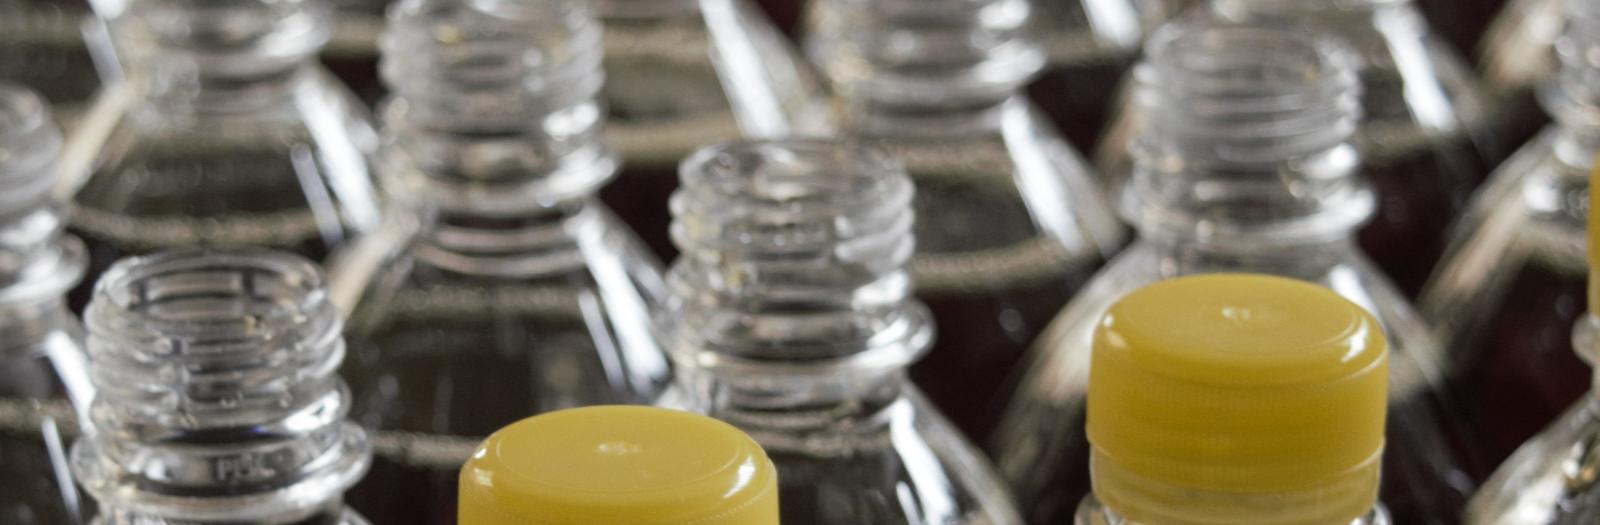 Clear plastic bottles